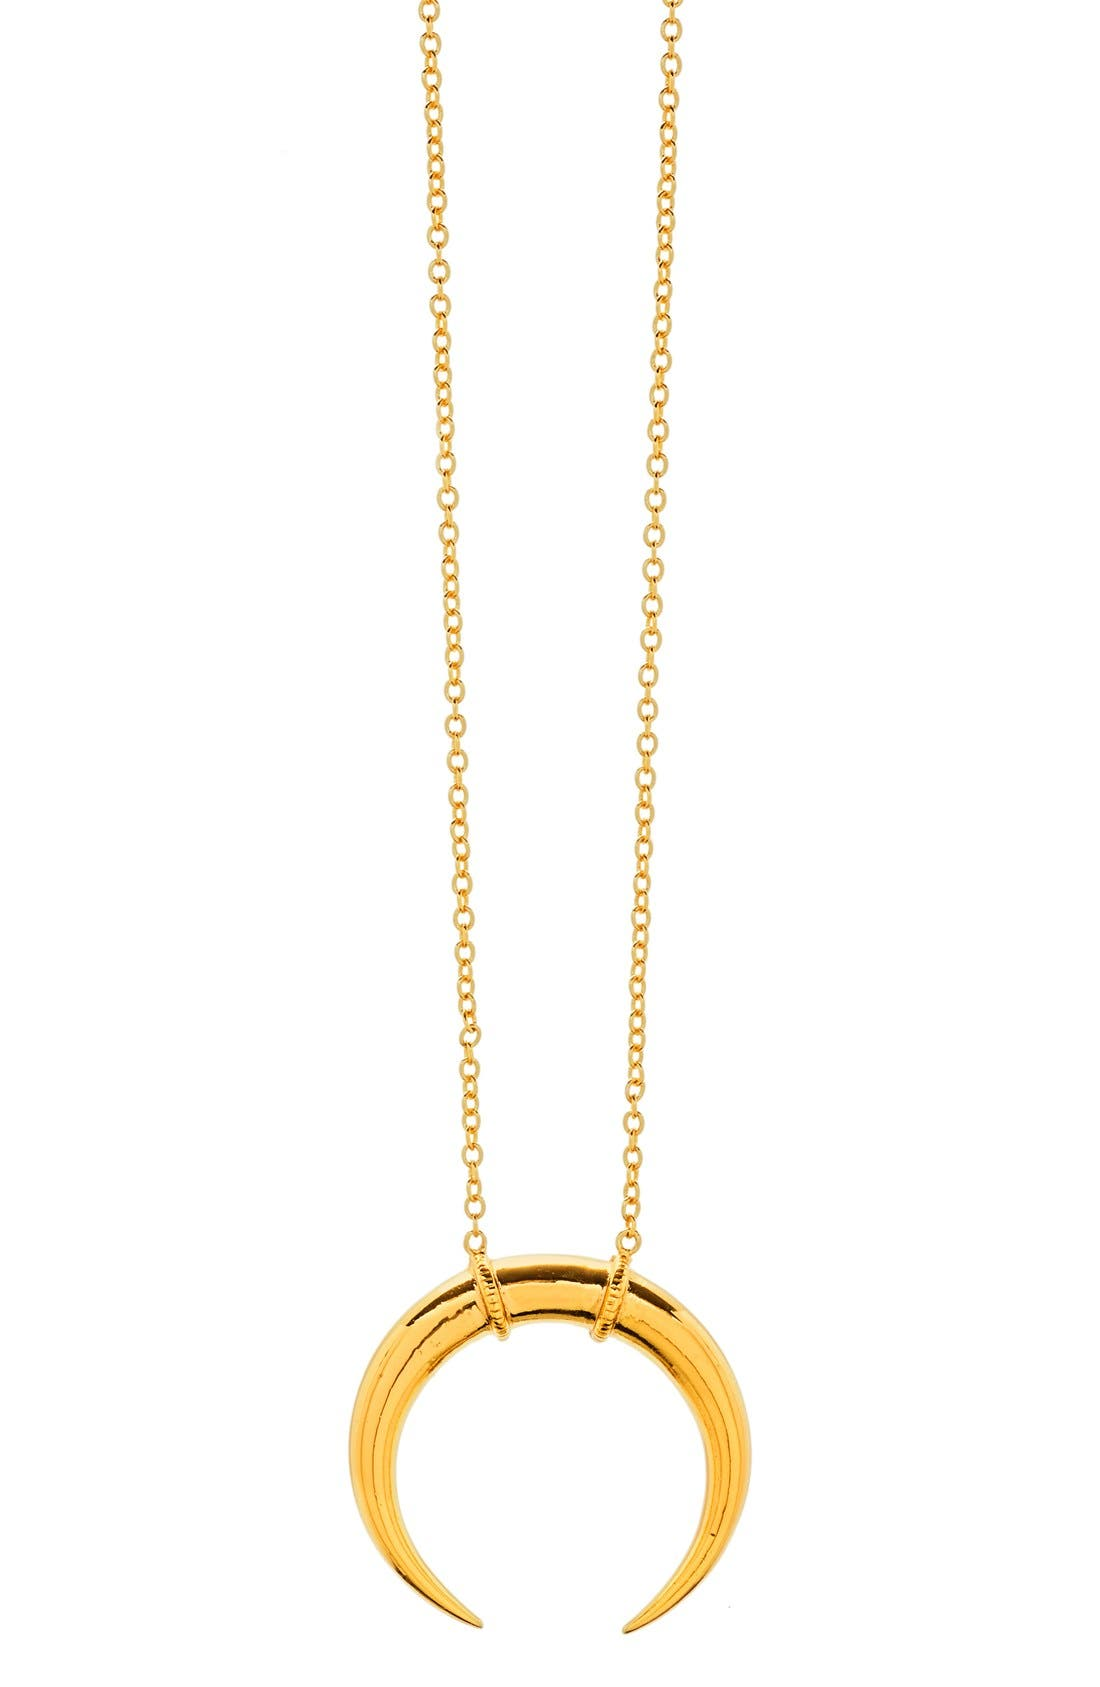 gorjana 'Cayne' Crescent Pendant Necklace